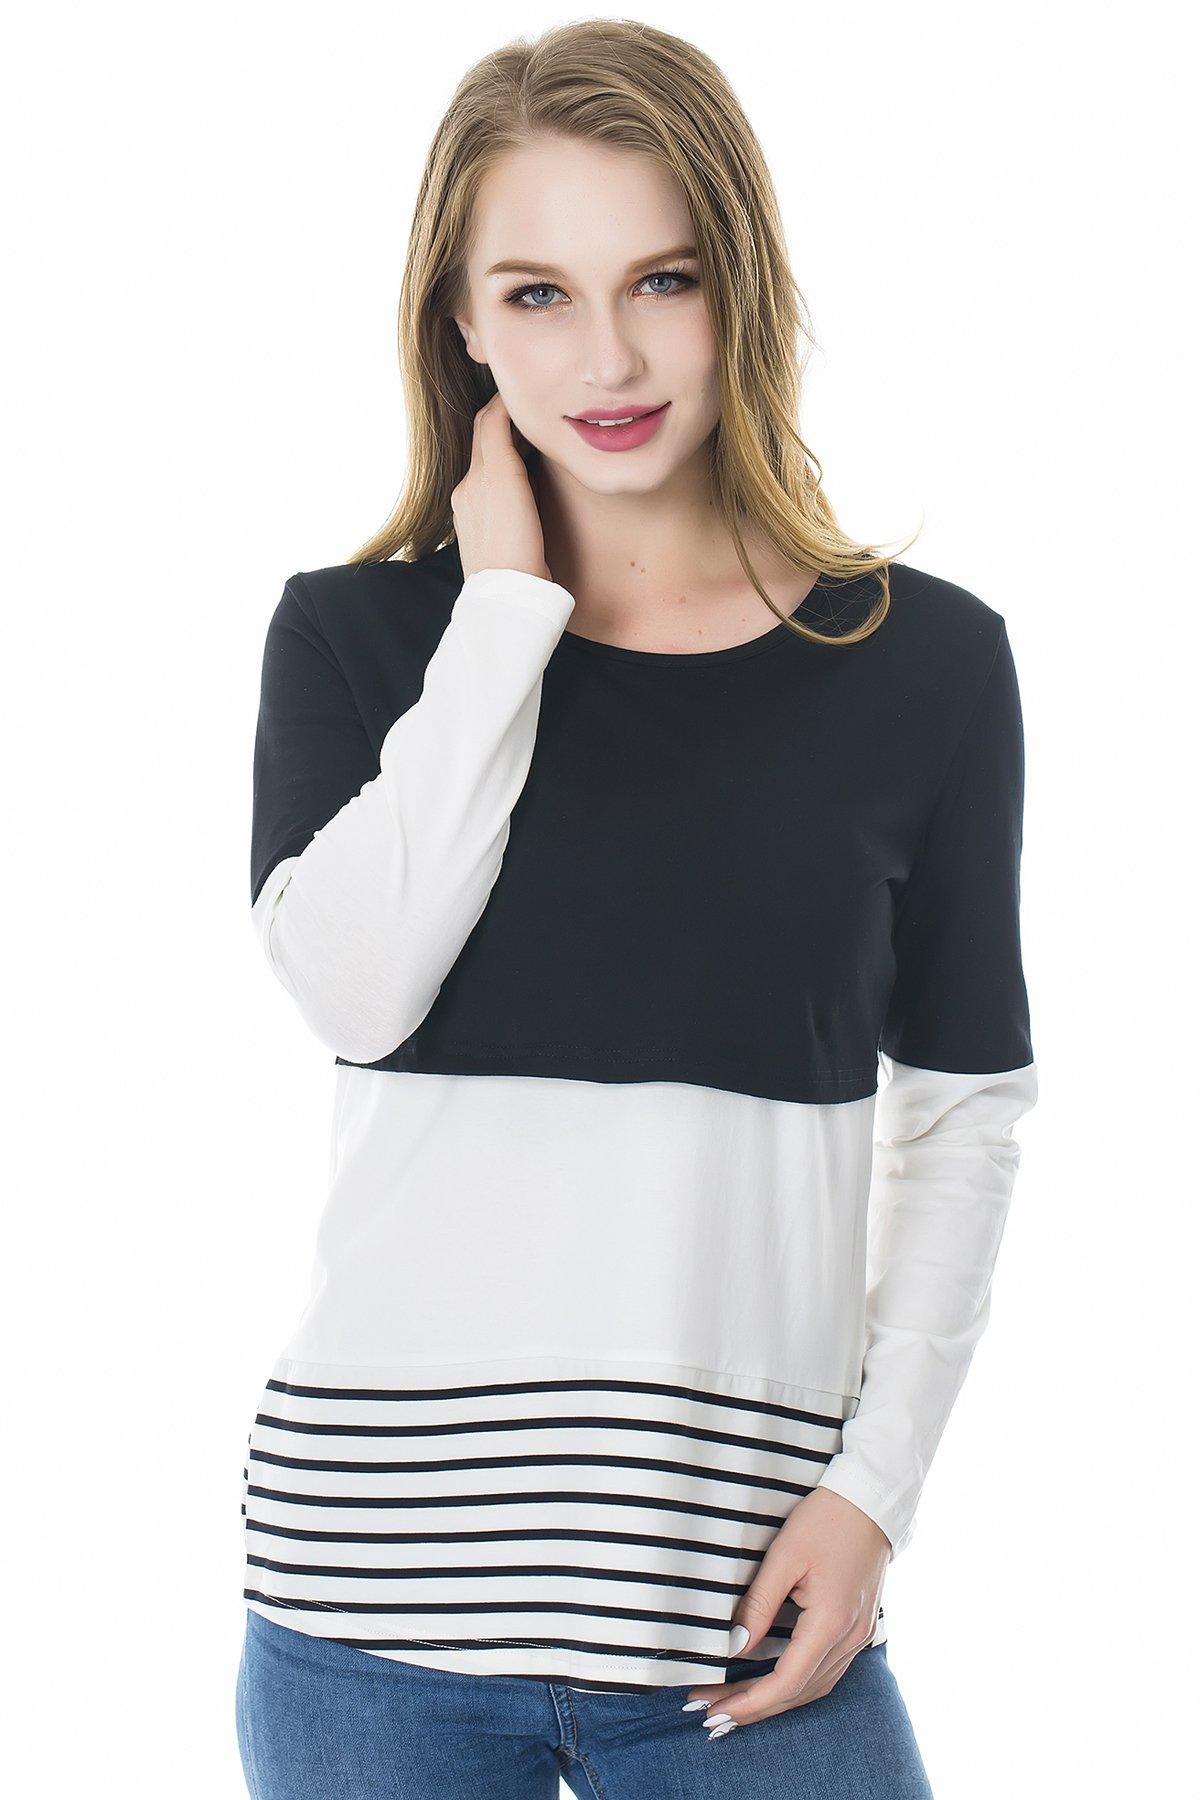 Smallshow Women's Long Sleeve Back Lace Maternity Nursing Tops Black X-Large